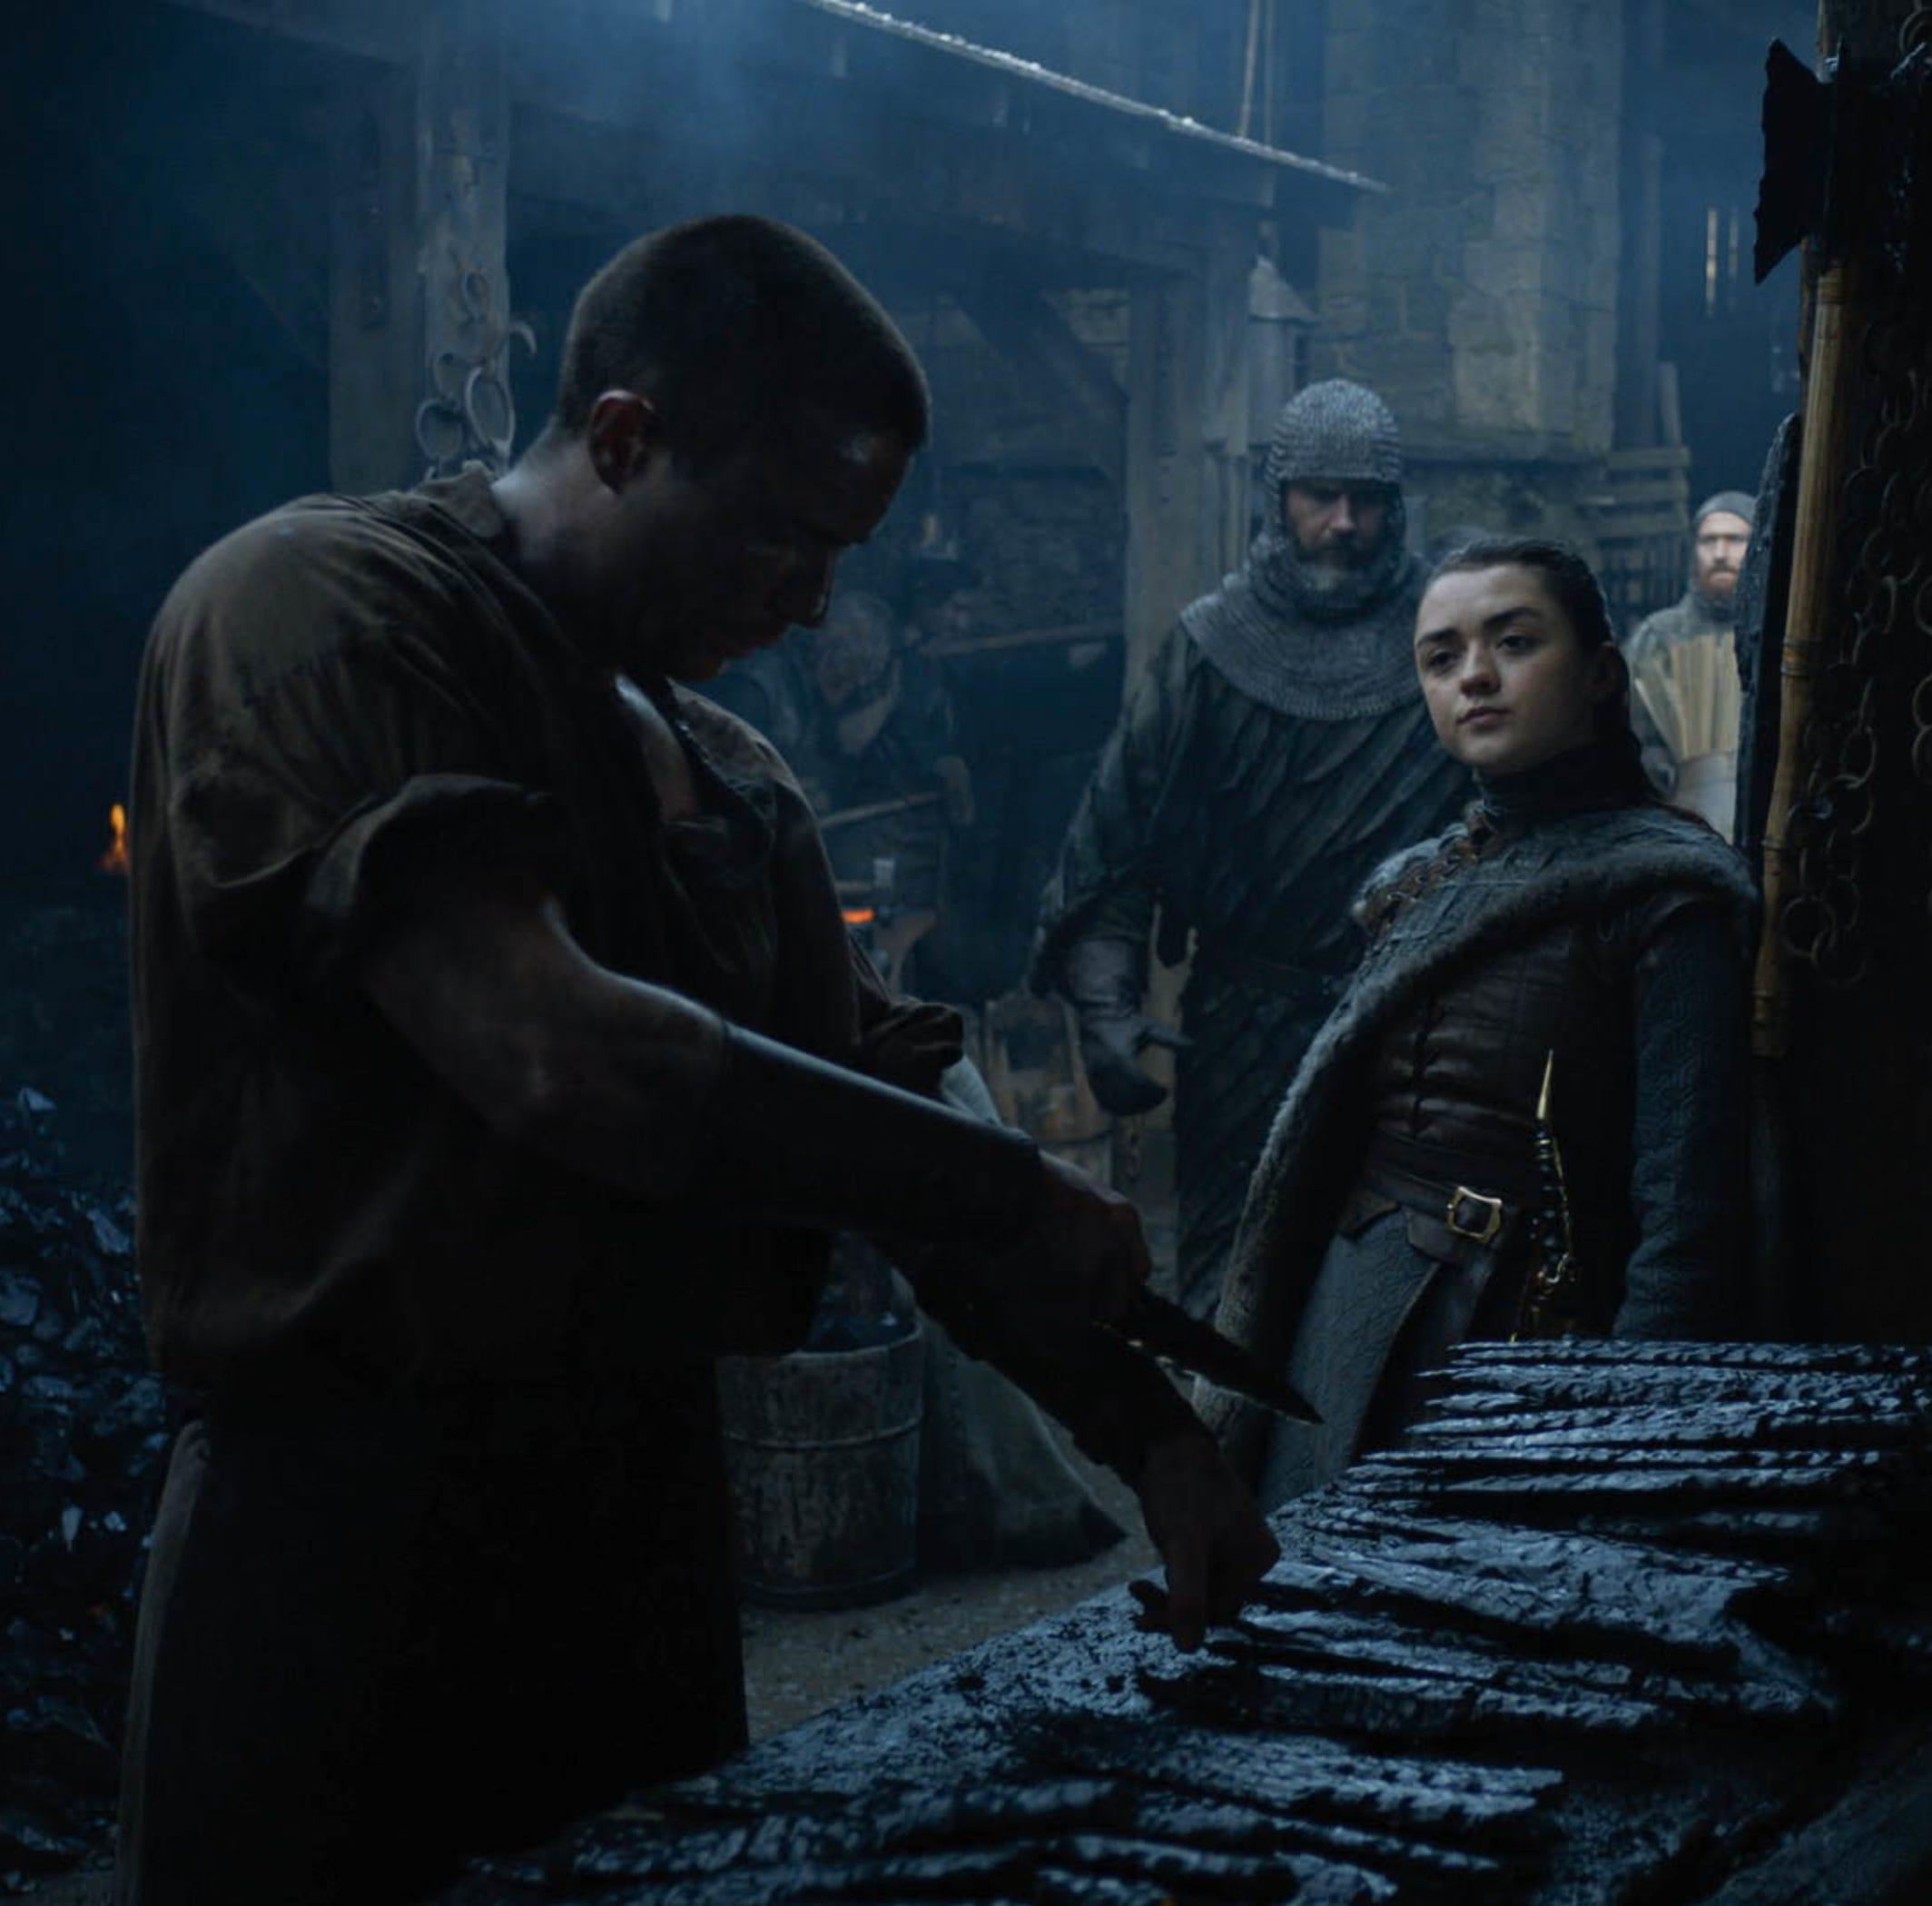 Joe Dempsie as Gendry, left, and Maisie Williams as Arya Stark on 'Game of Thrones.'